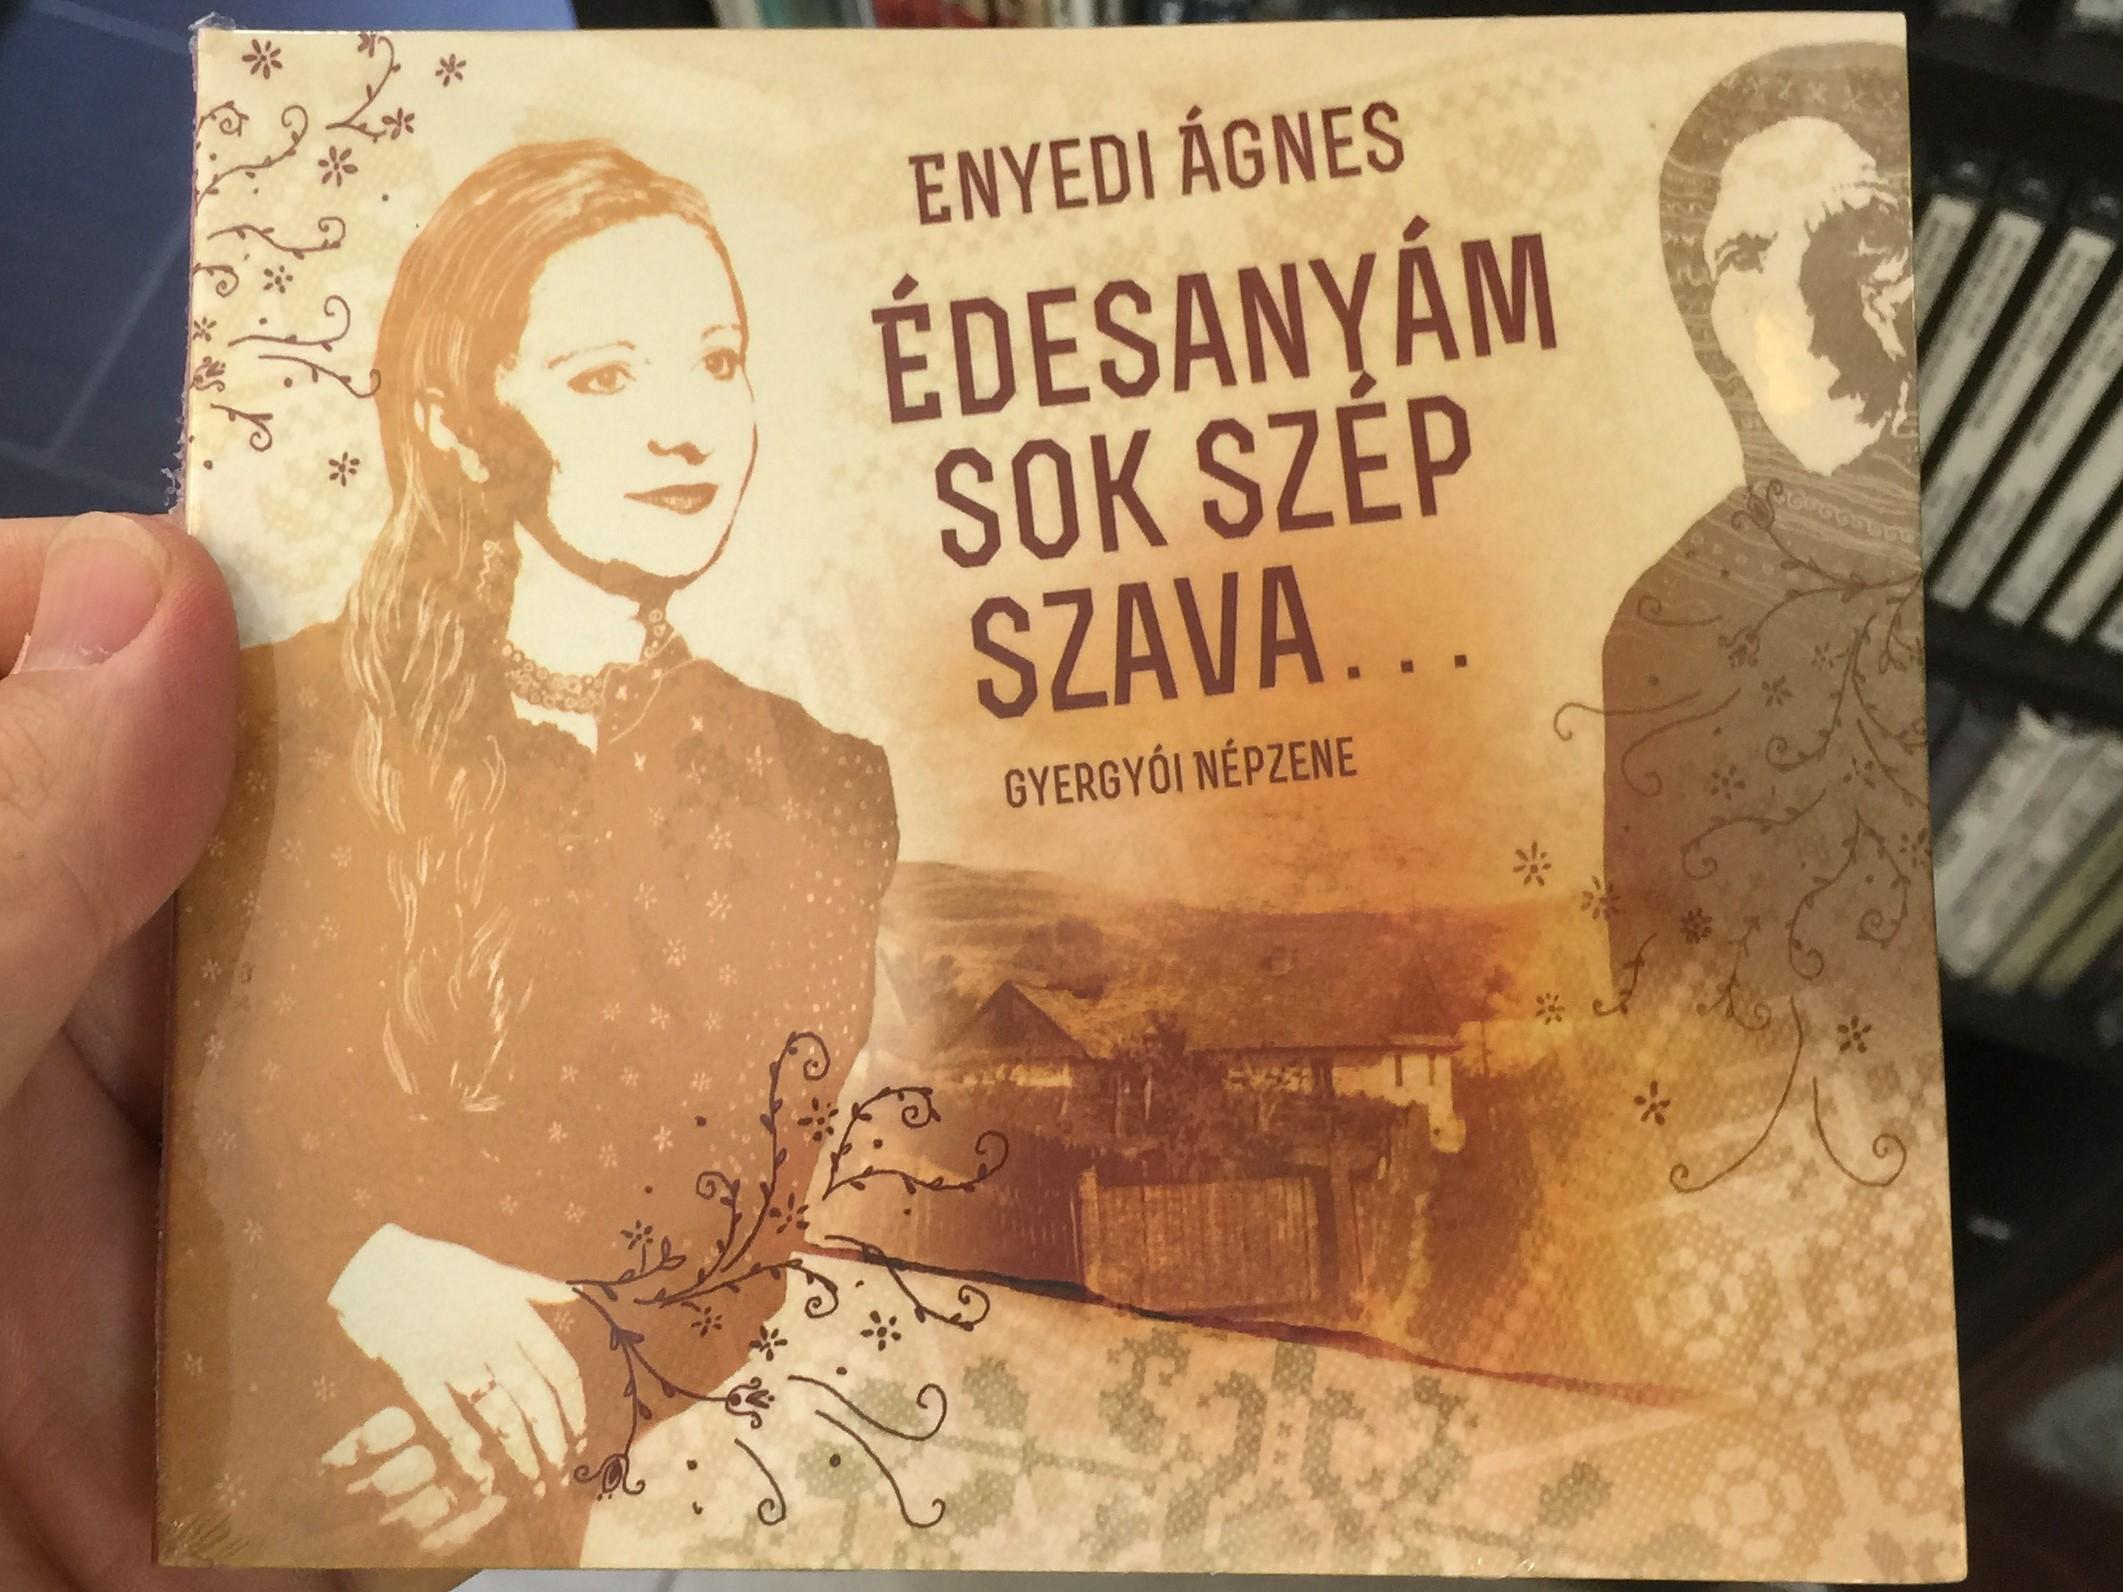 enyedi-gnes-desany-m-sok-sz-p-szava...-gyergy-i-n-pzene-folk-eur-pa-audio-cd-2018-1-.jpg